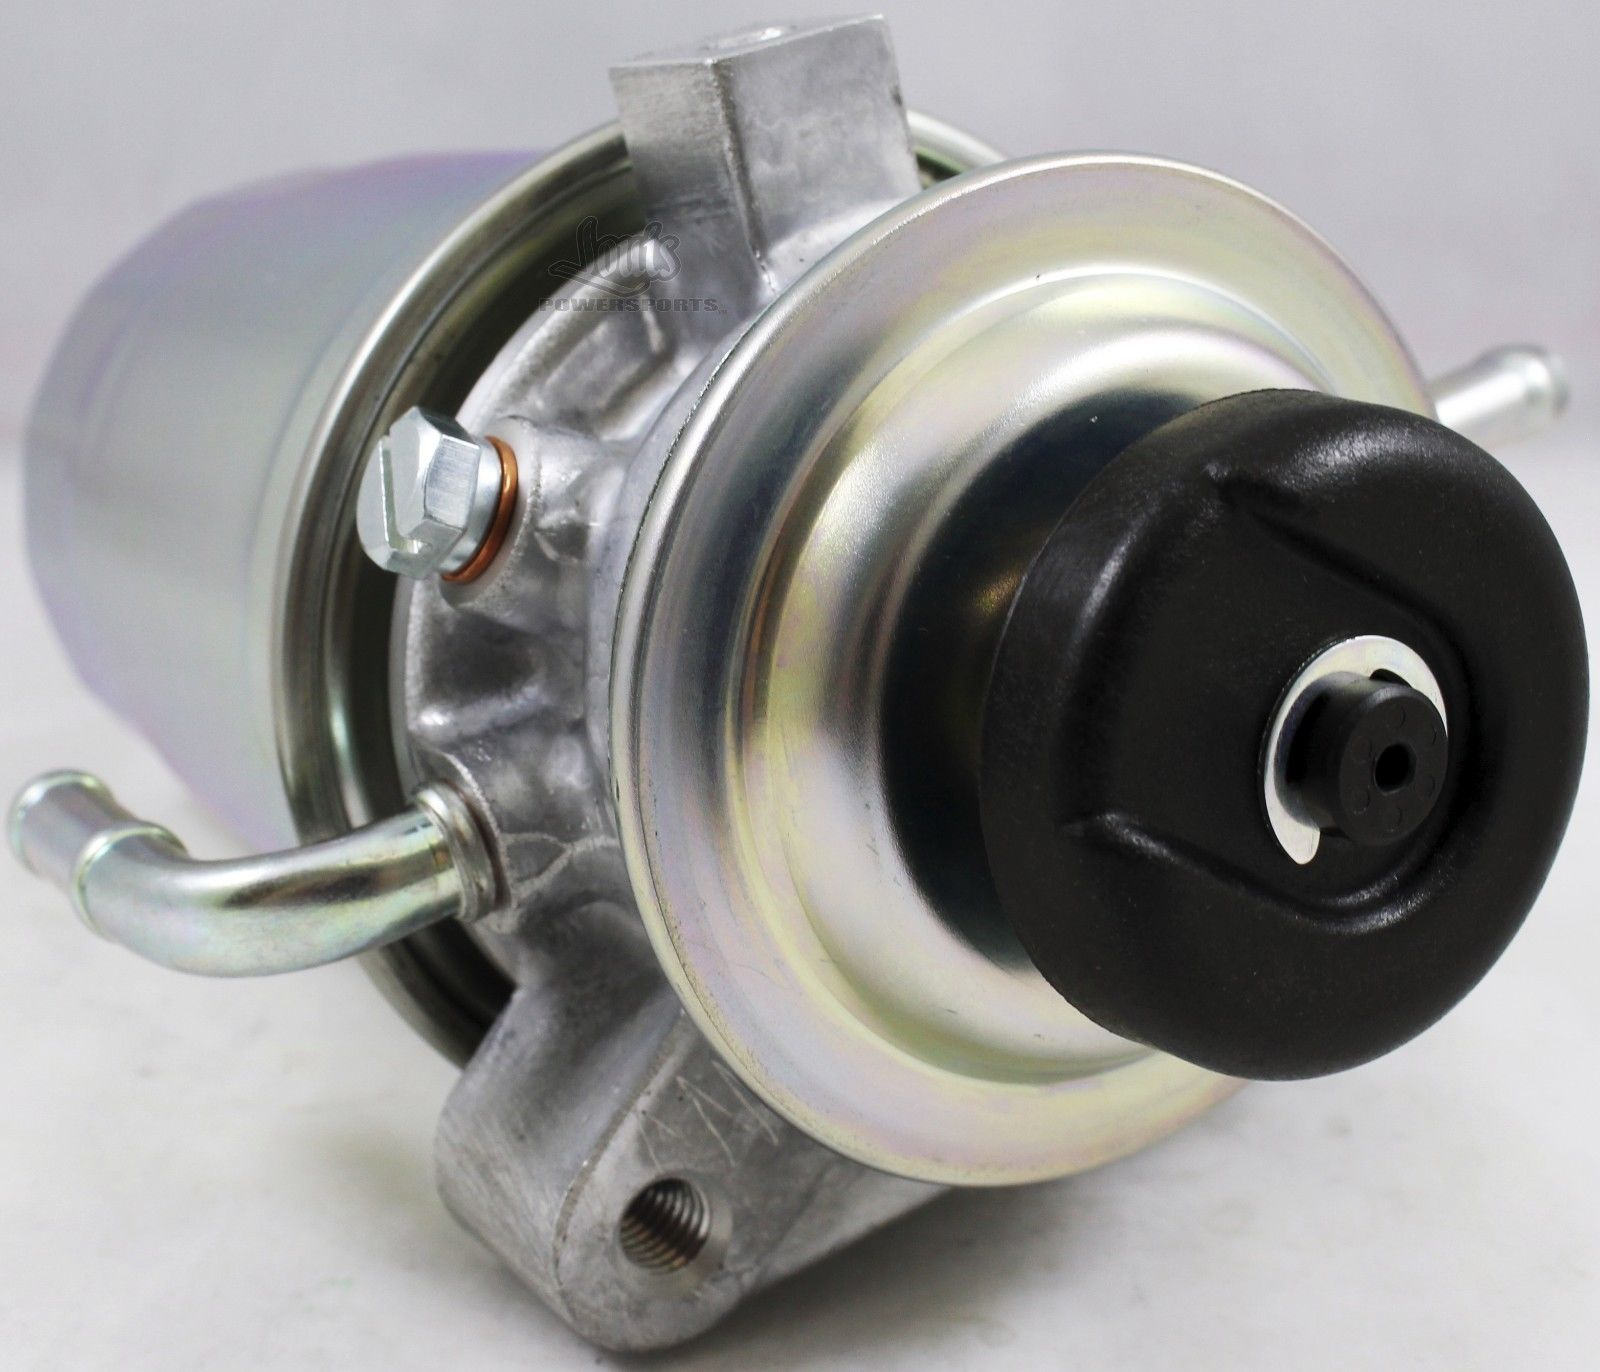 hight resolution of kawasaki 2000 2013 mule 2510 4010 diesel trans fuel filter 49019 1094 new oem walmart com